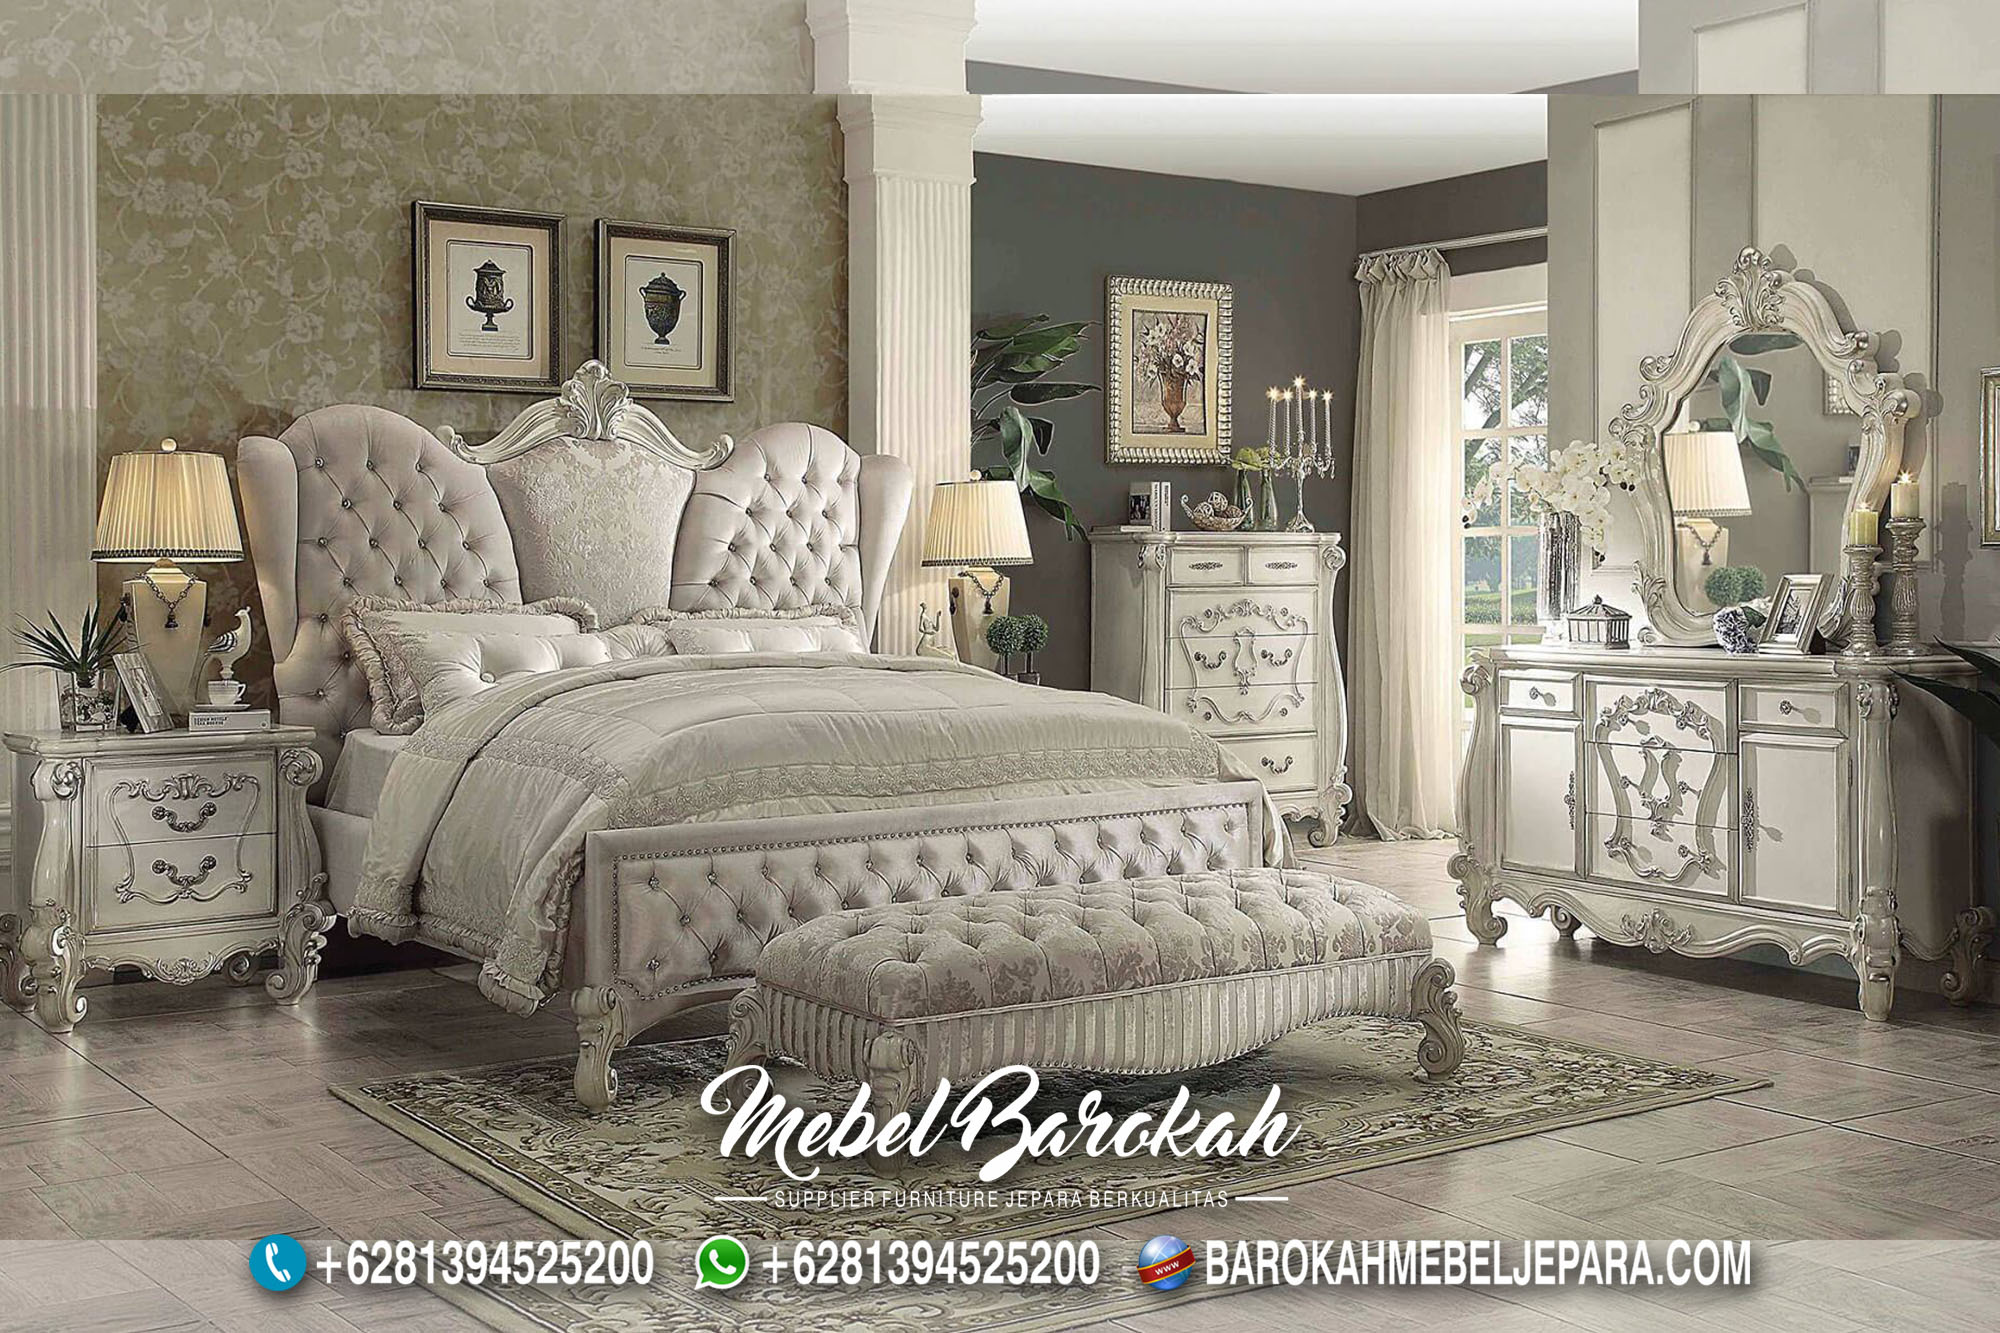 Bed Set Luxury Kourtney Kardashian Model MB-690